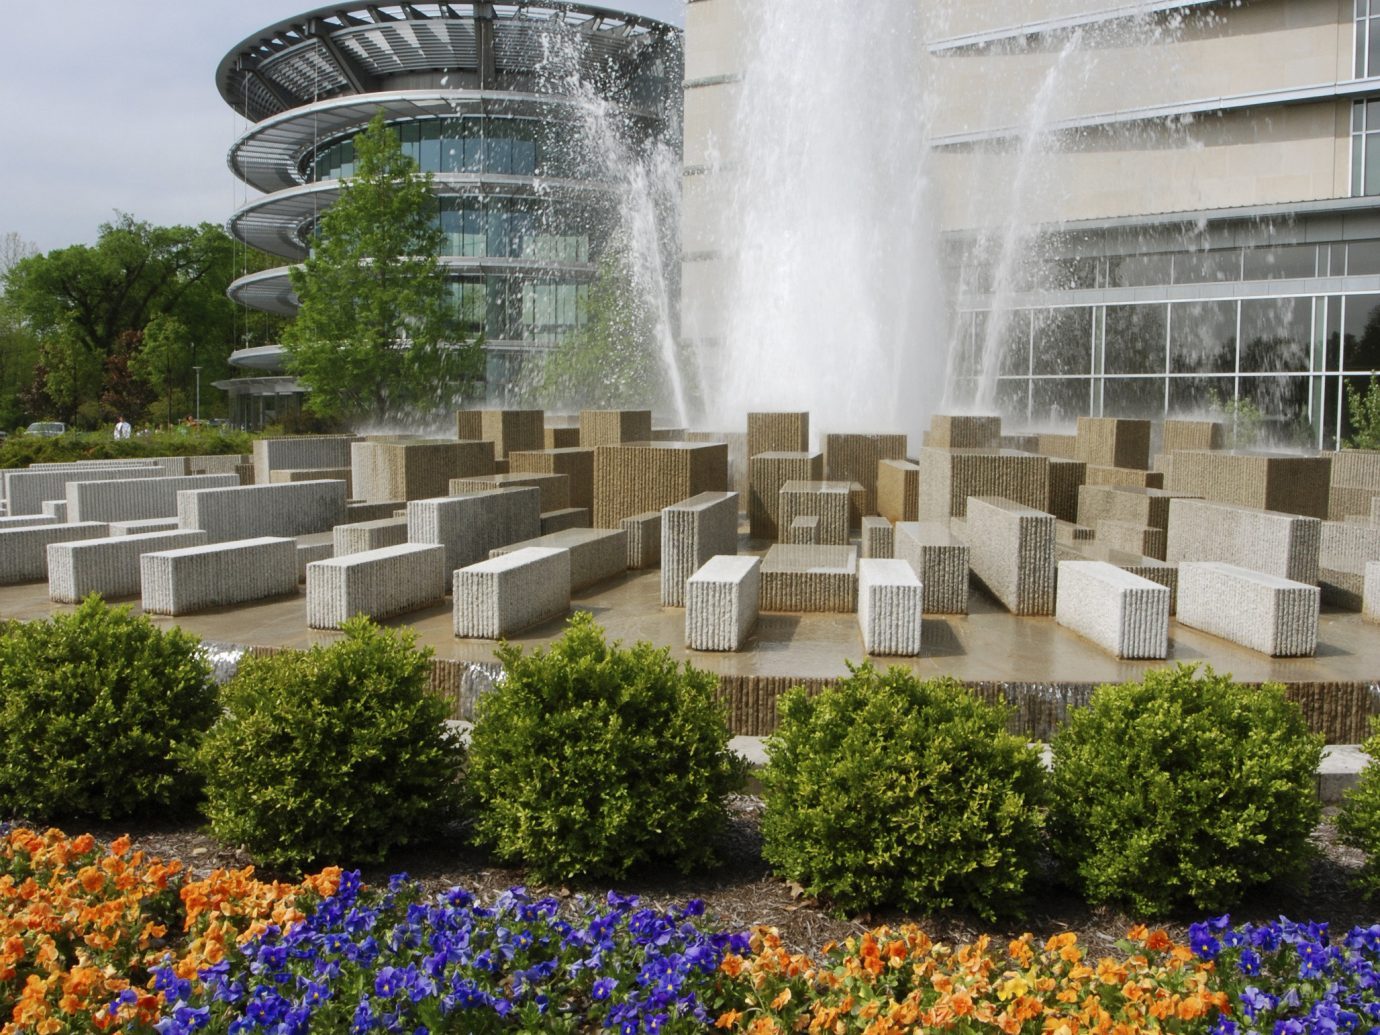 Trip Ideas Weekend Getaways outdoor flower landmark building fountain water feature park Garden memorial monument crowd